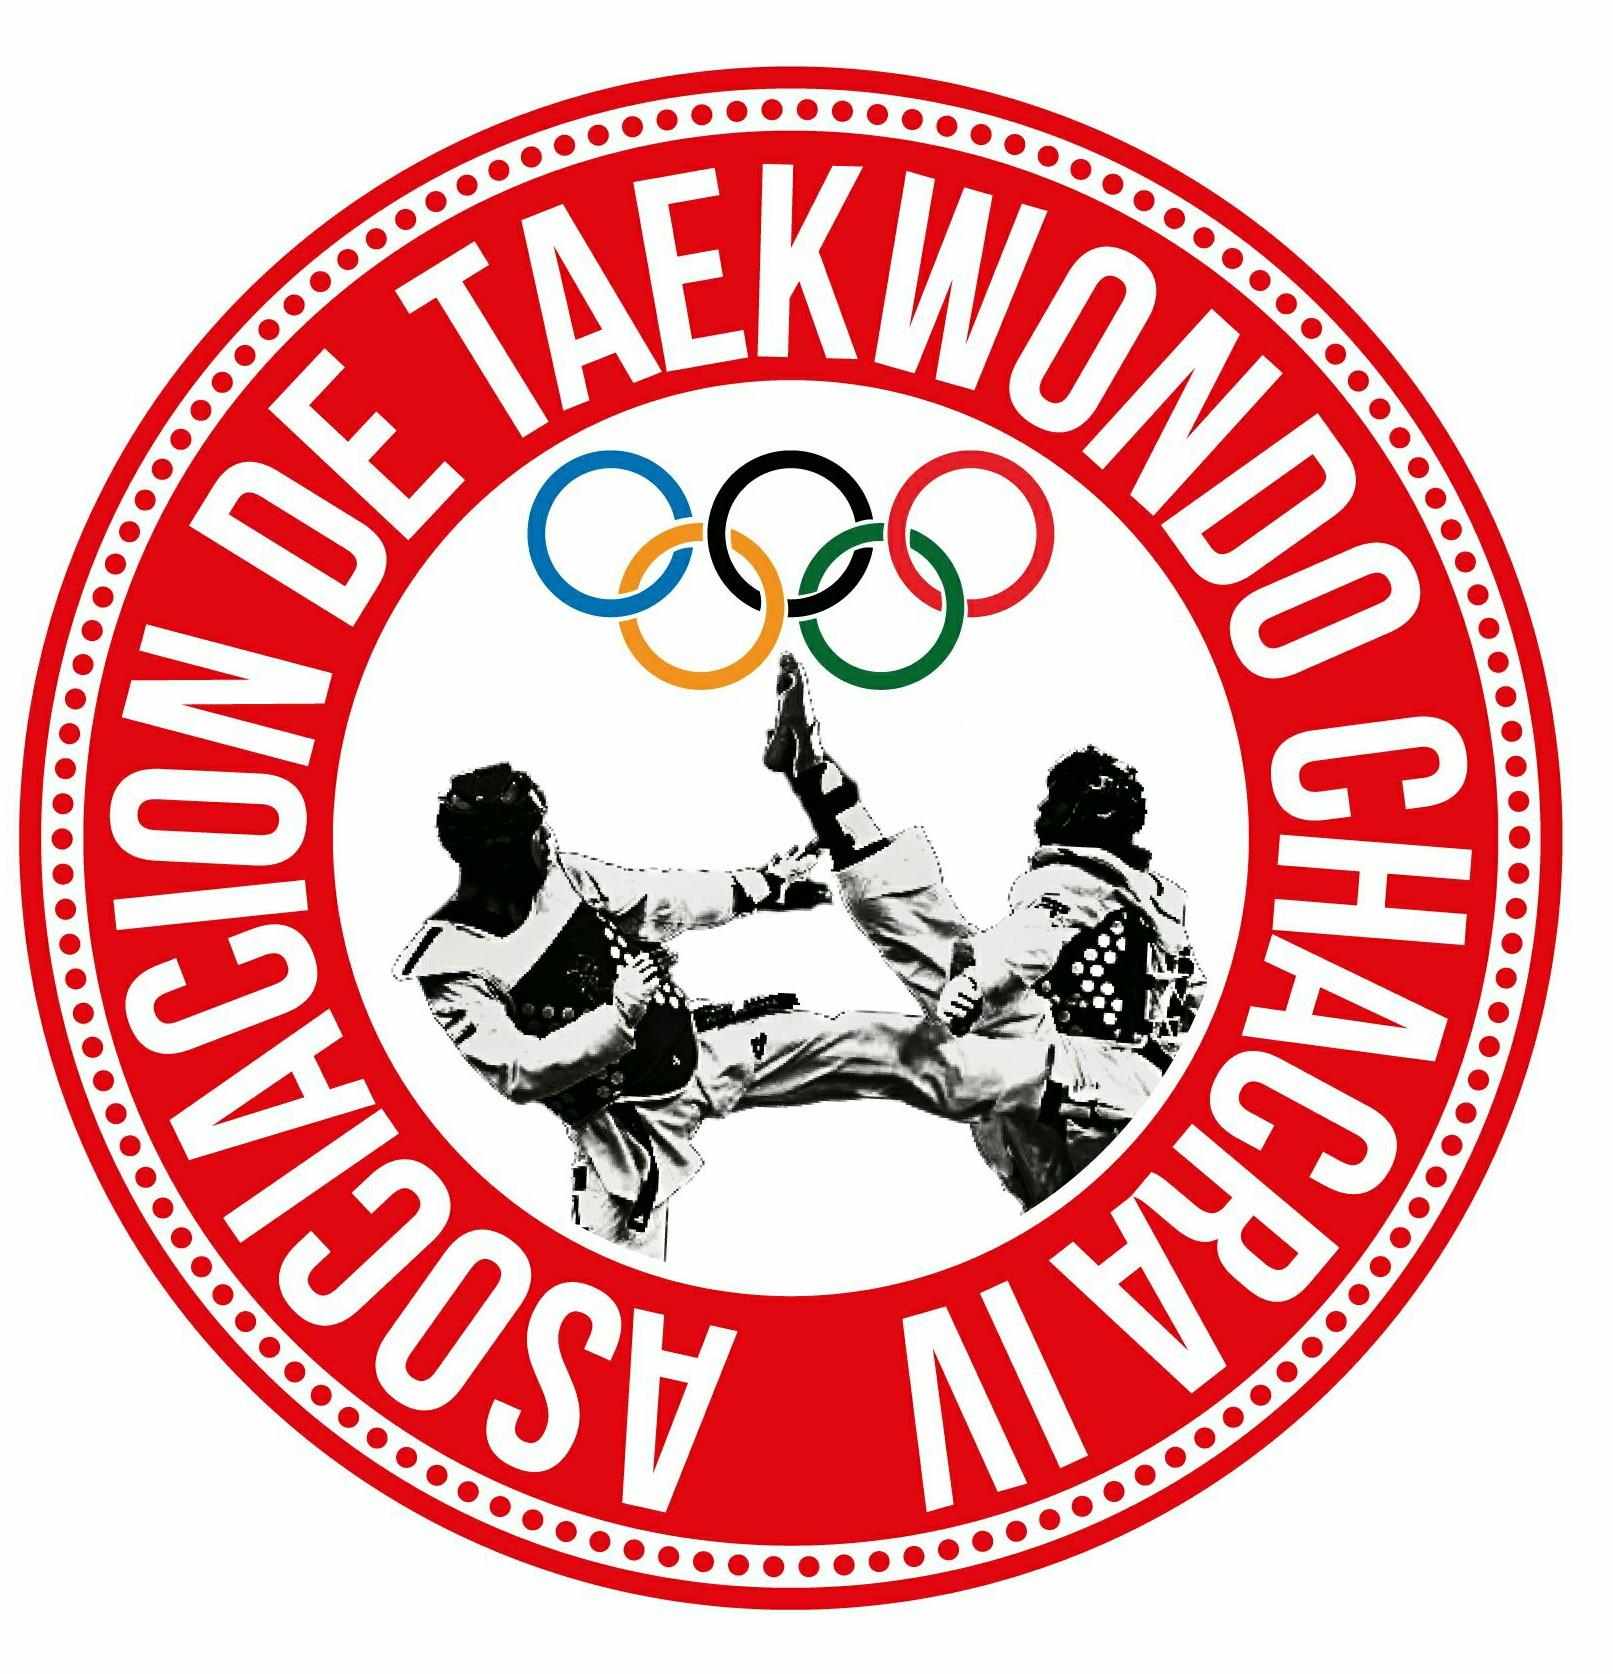 Asociación de Taekwondo Olímpico Chacra IV – Tierra del Fuego